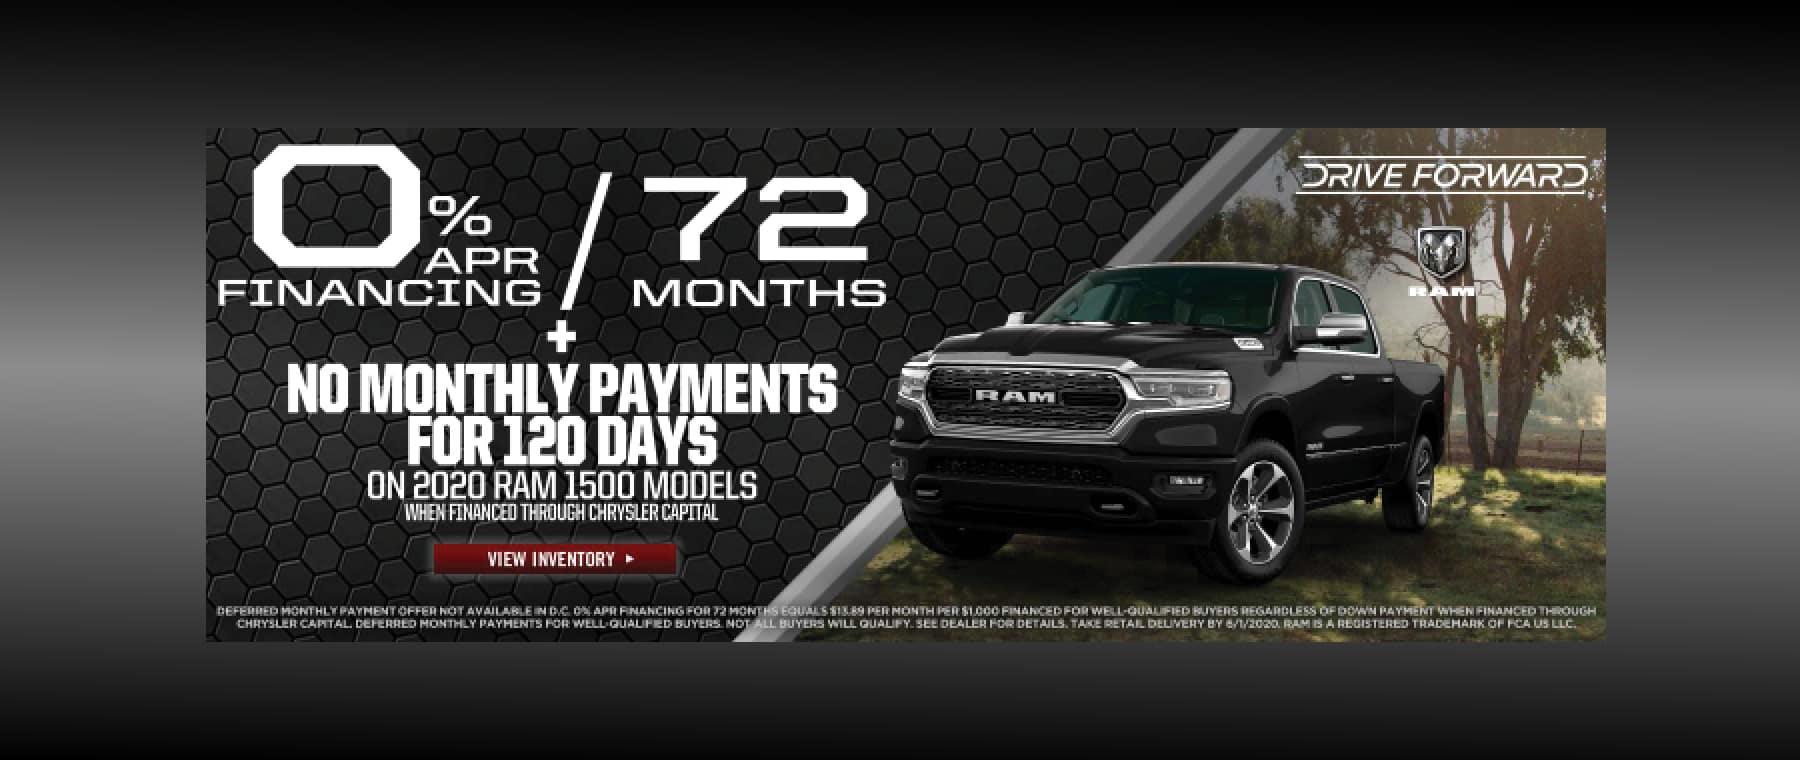 Ram Trucks 0% Financing